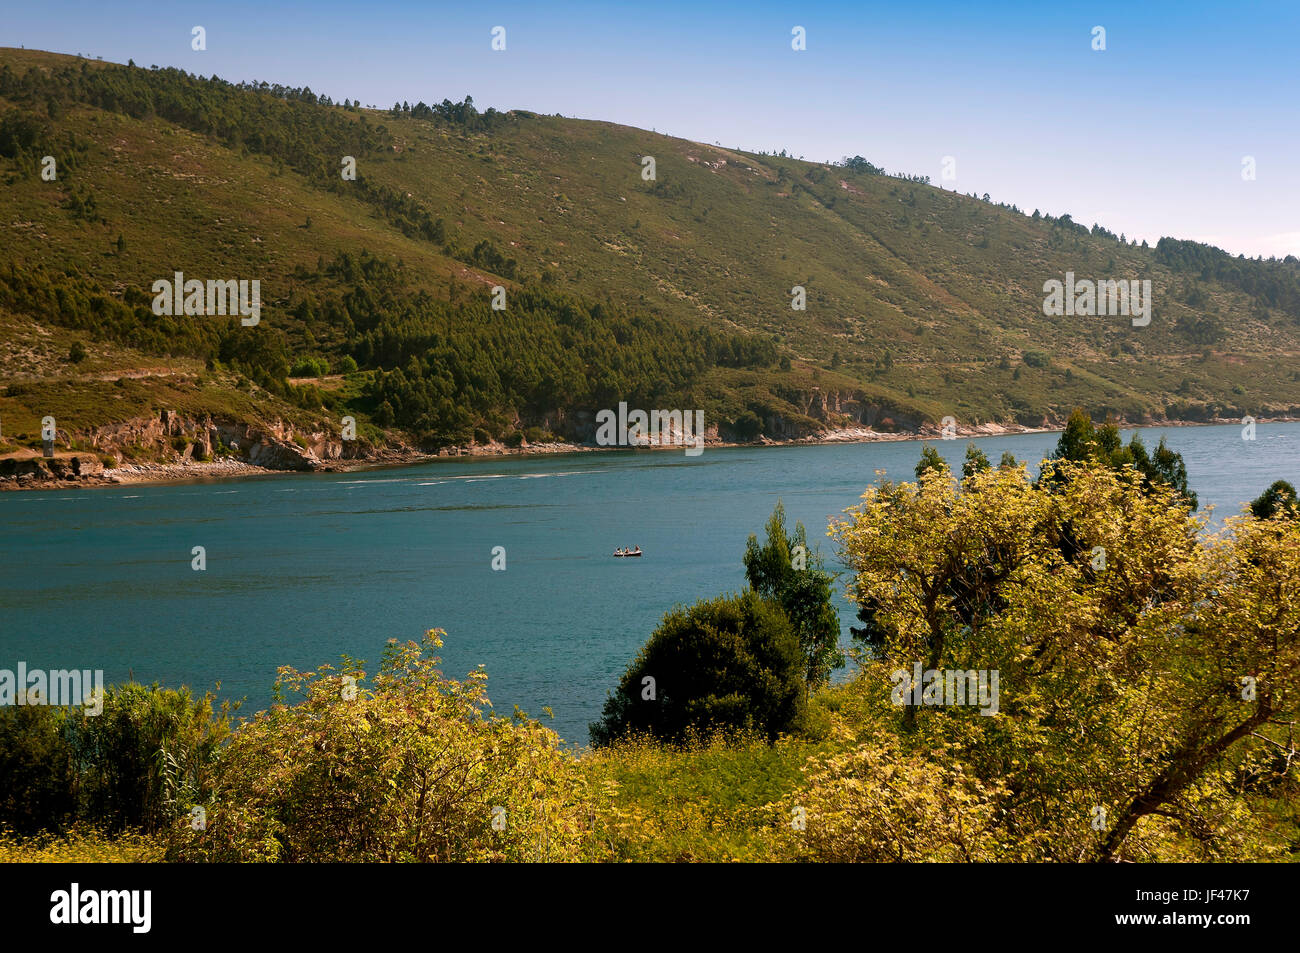 Estuary, Ferrol, La Coruna province, Region of Galicia, Spain, Europe - Stock Image